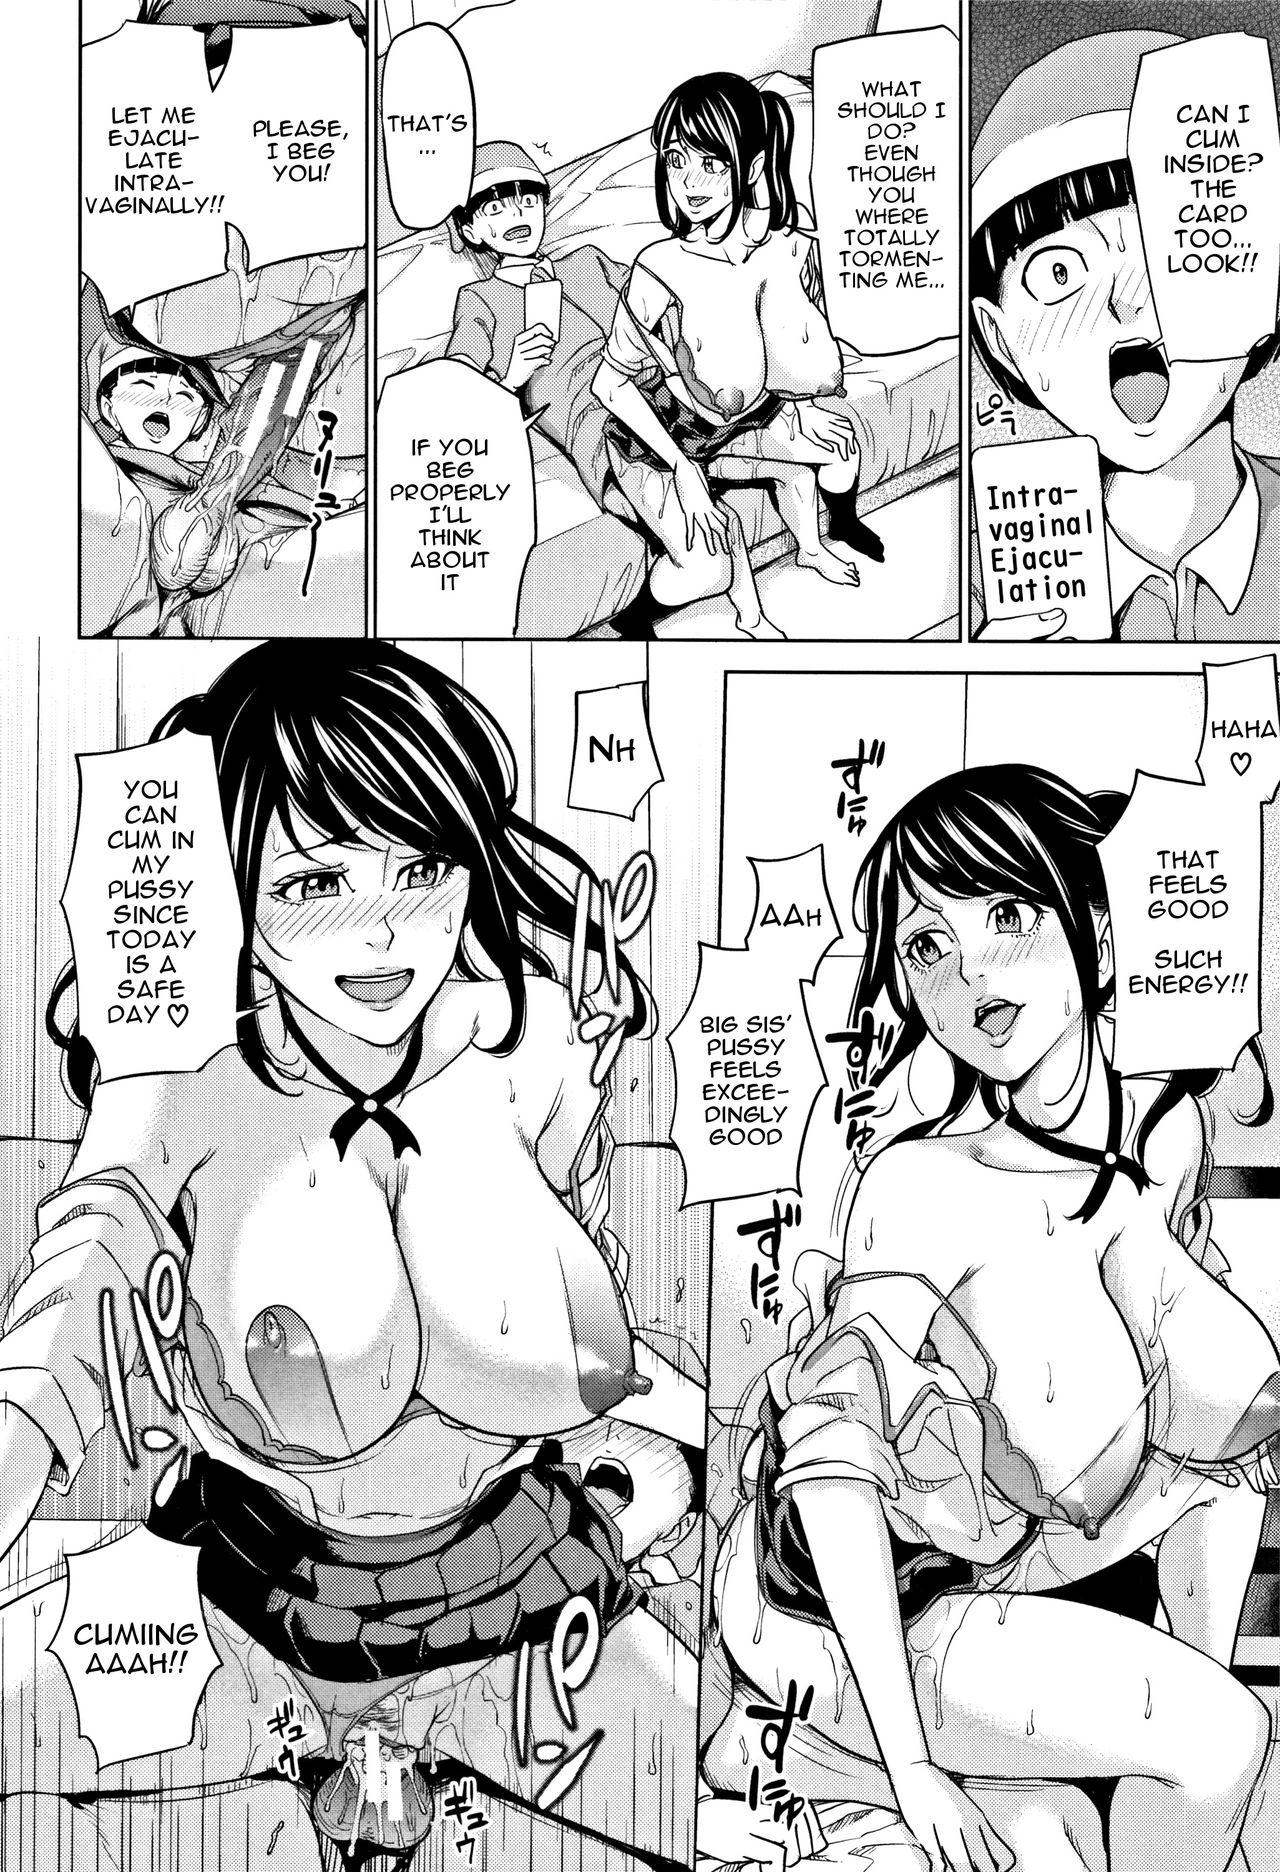 [Maimu-Maimu] Kazoku Soukan Game - family Incest game Ch. 1-3 [English] [Januz] 60